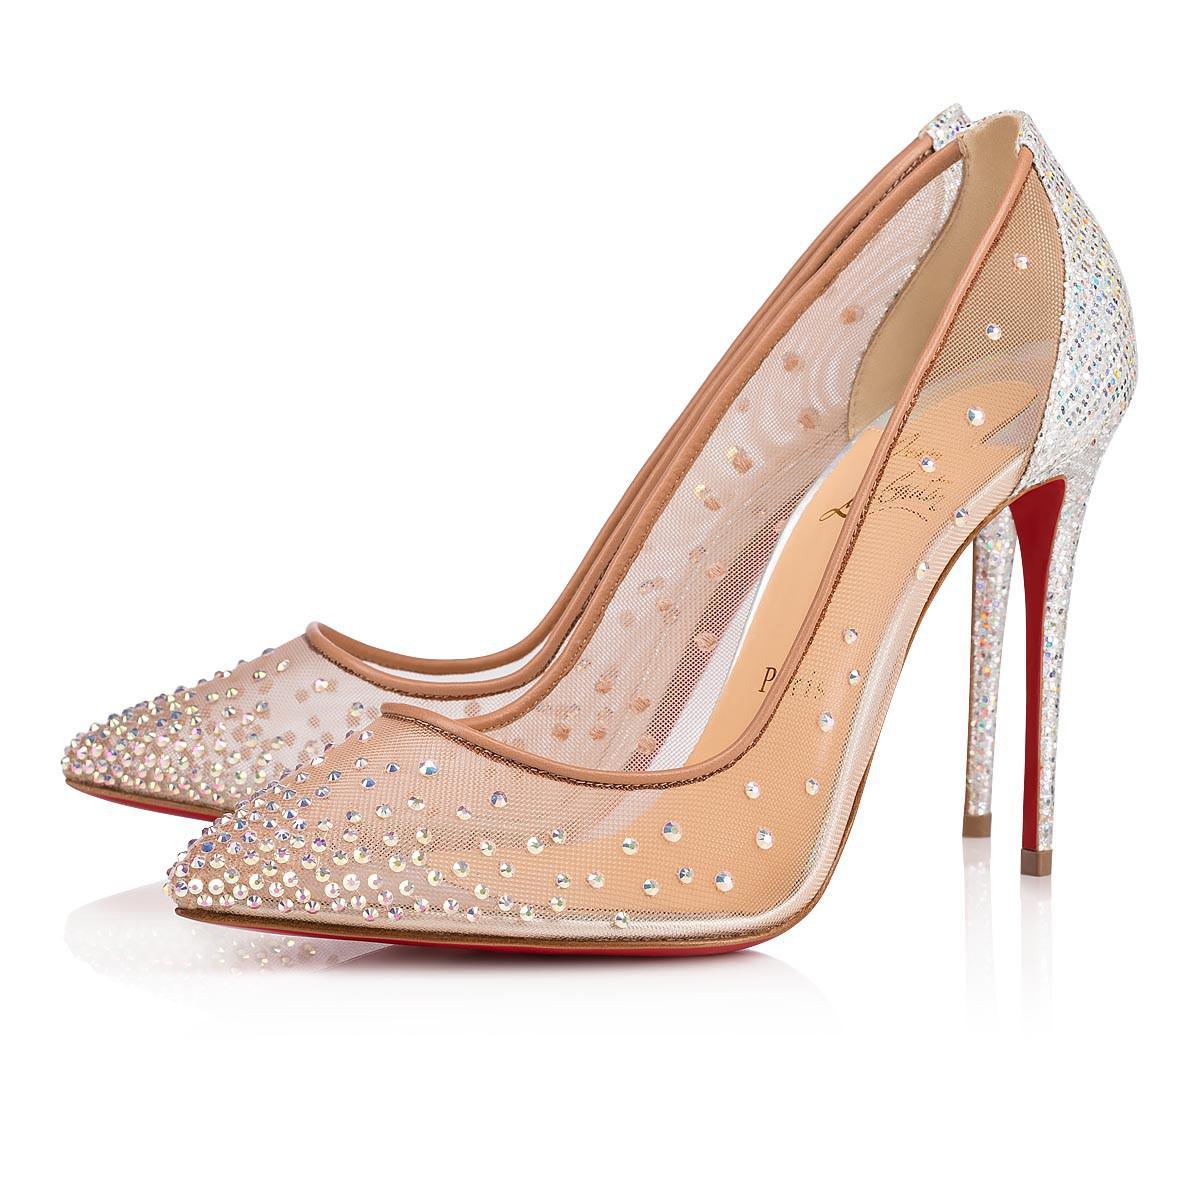 1c70f2dc324 Christian Louboutin. Women s Metallic Follies Strass Rete glitter Rainbow  100 Crystal Glitter